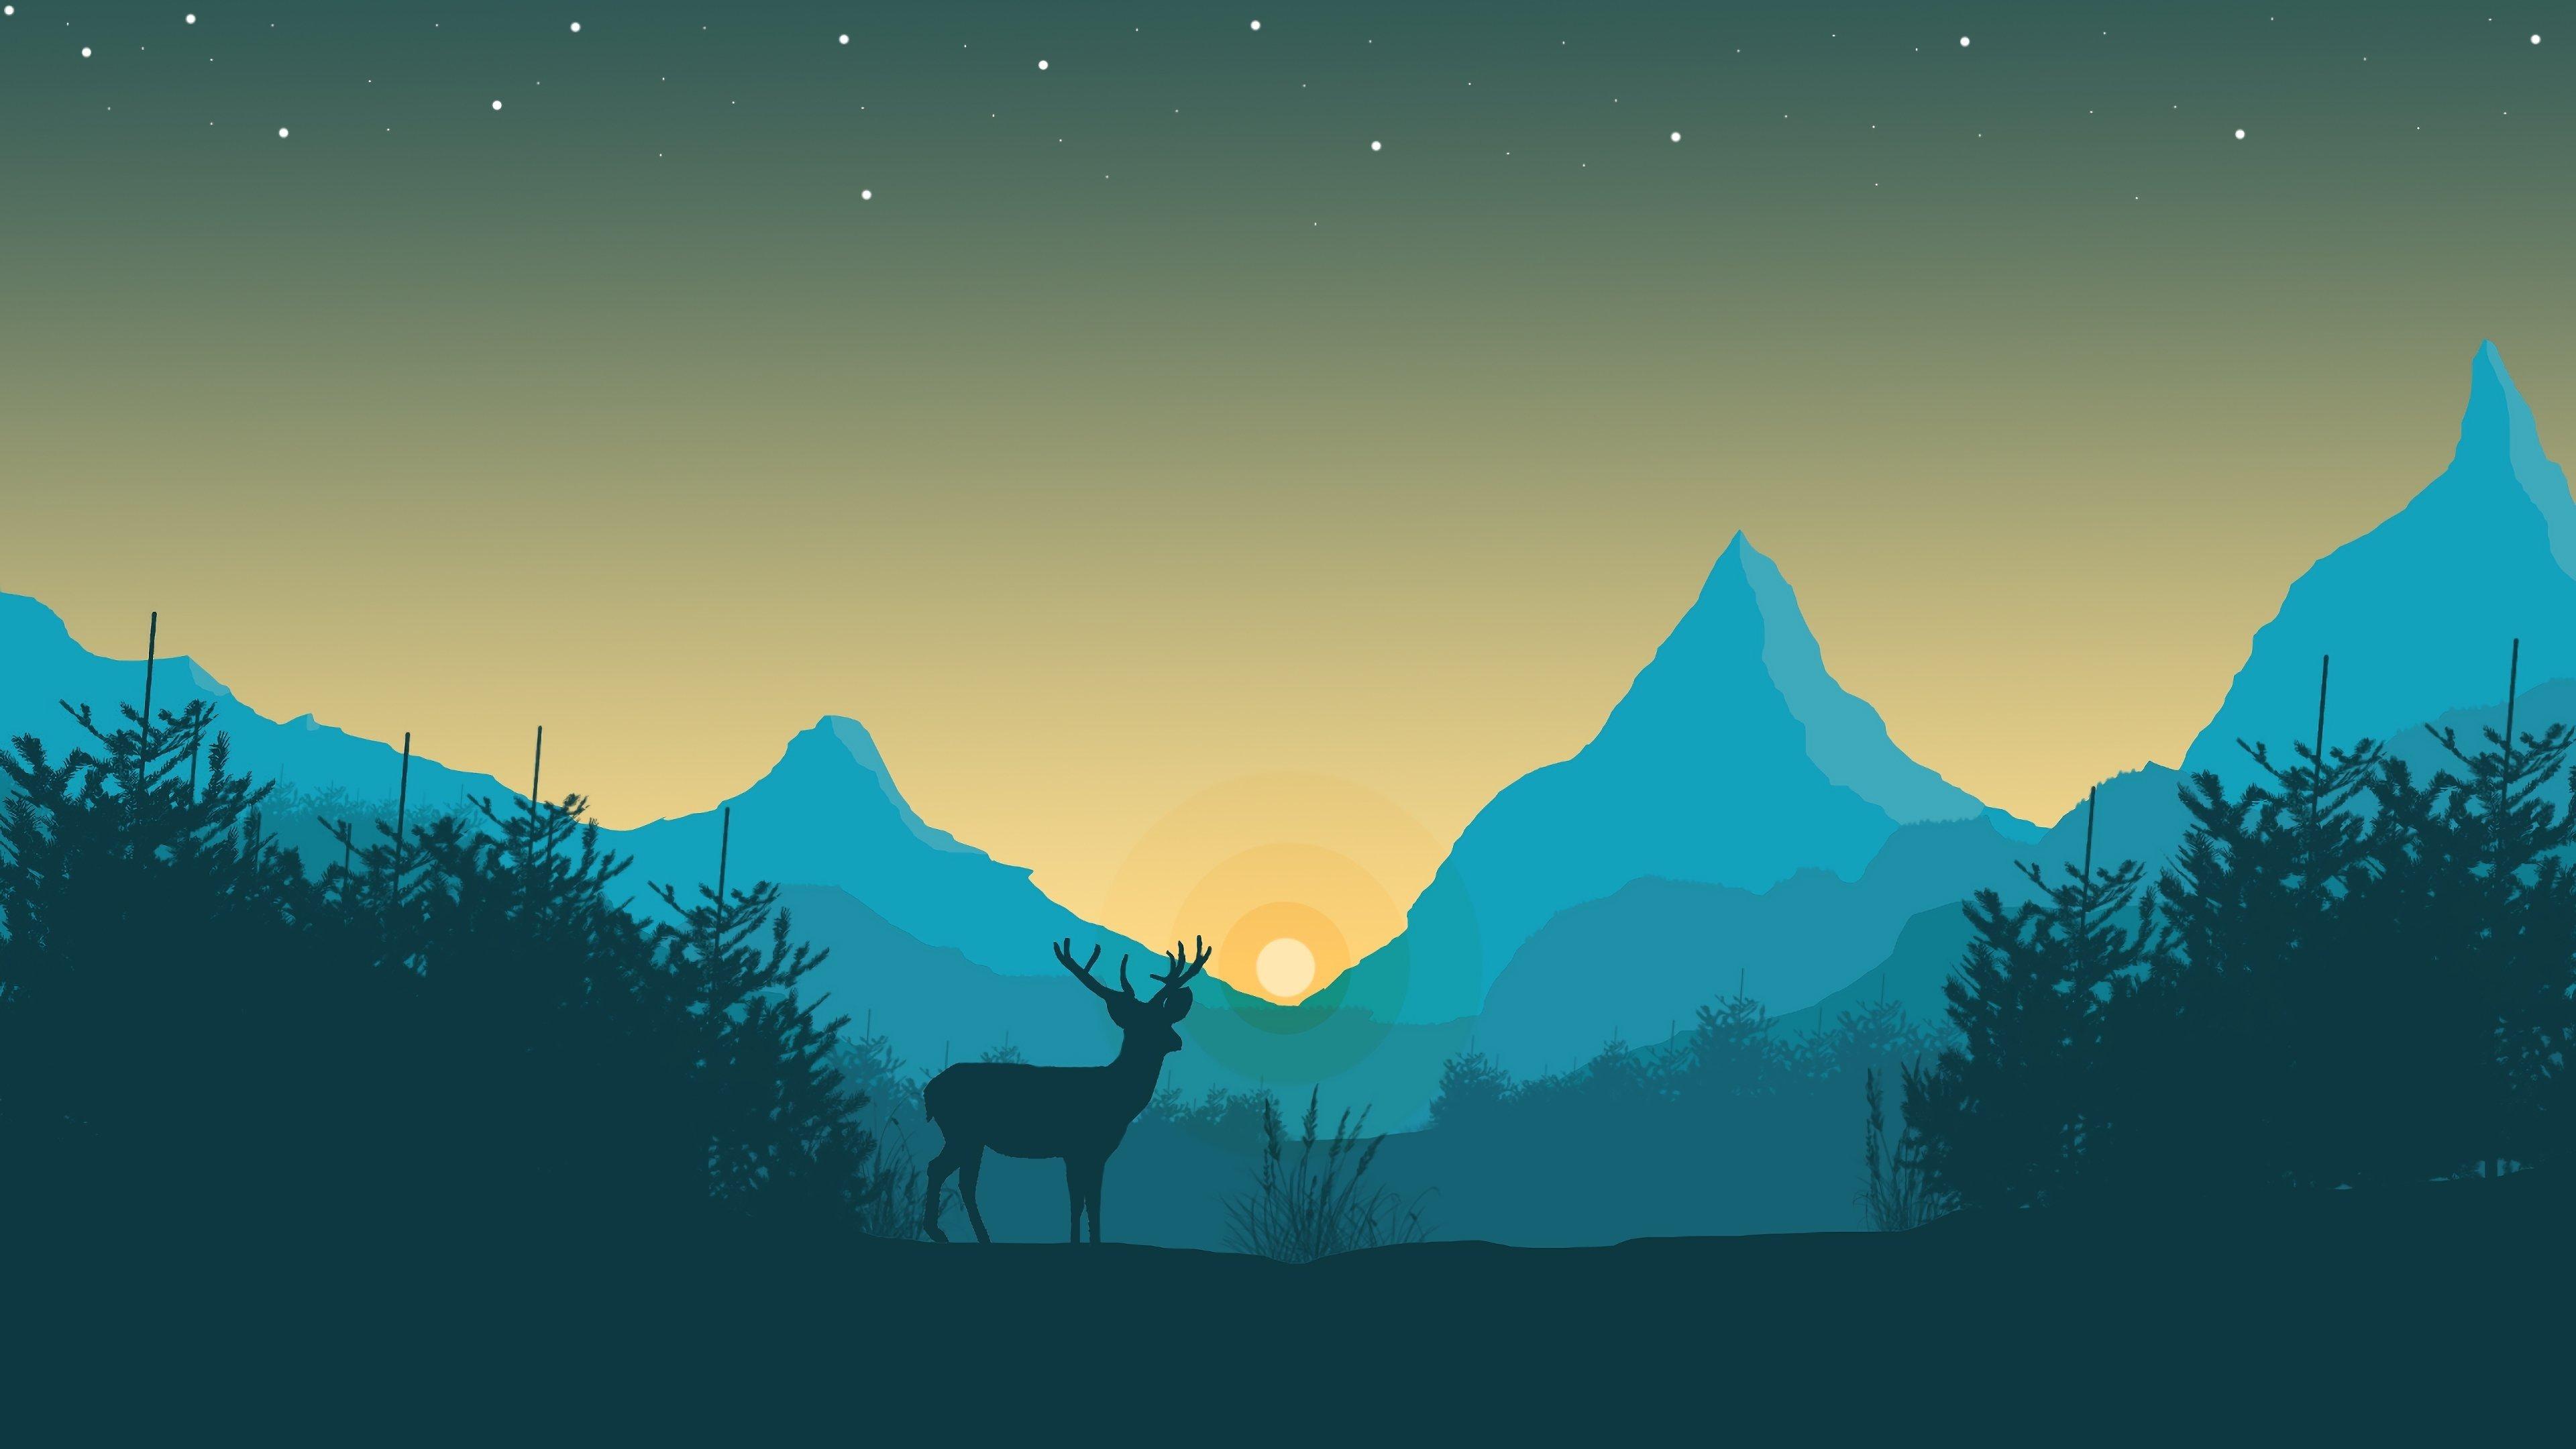 Minimalist 4k Wallpaper Image